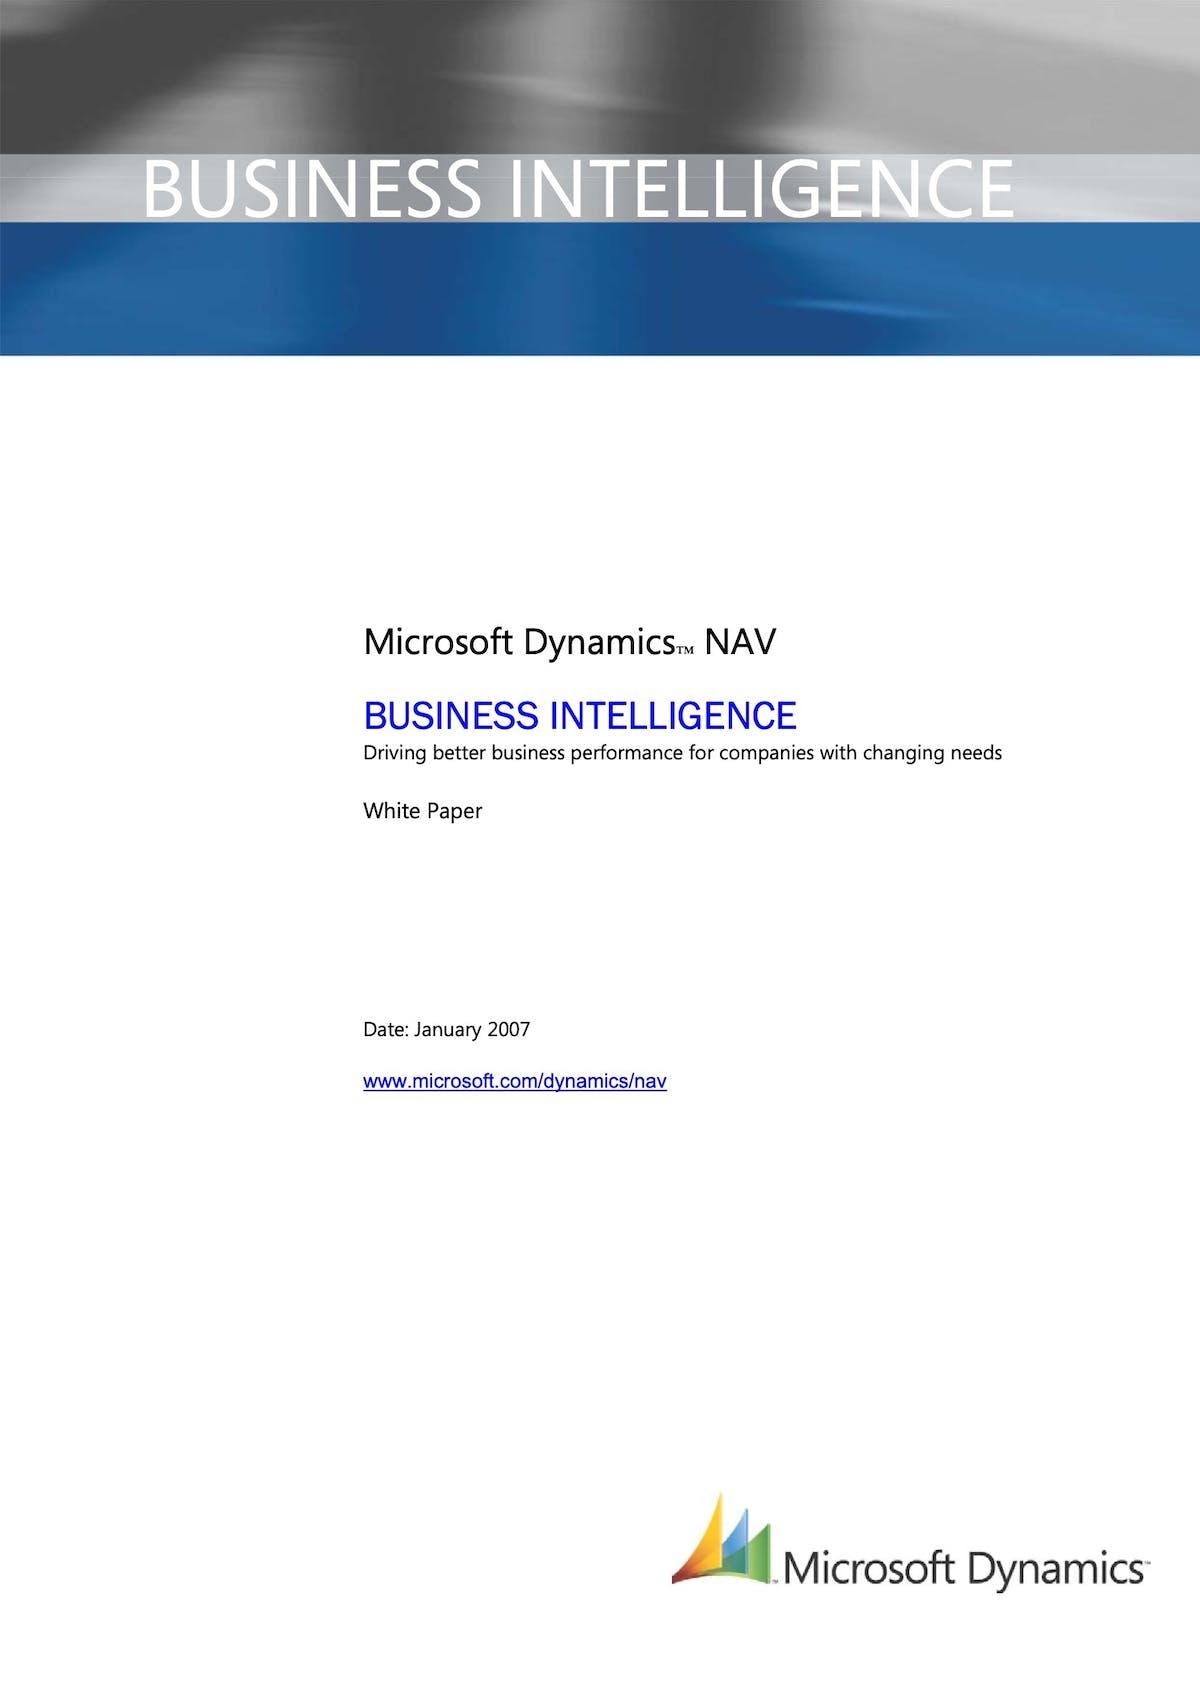 Microsoft Dynamics NAV White Paper - Business Intelligence